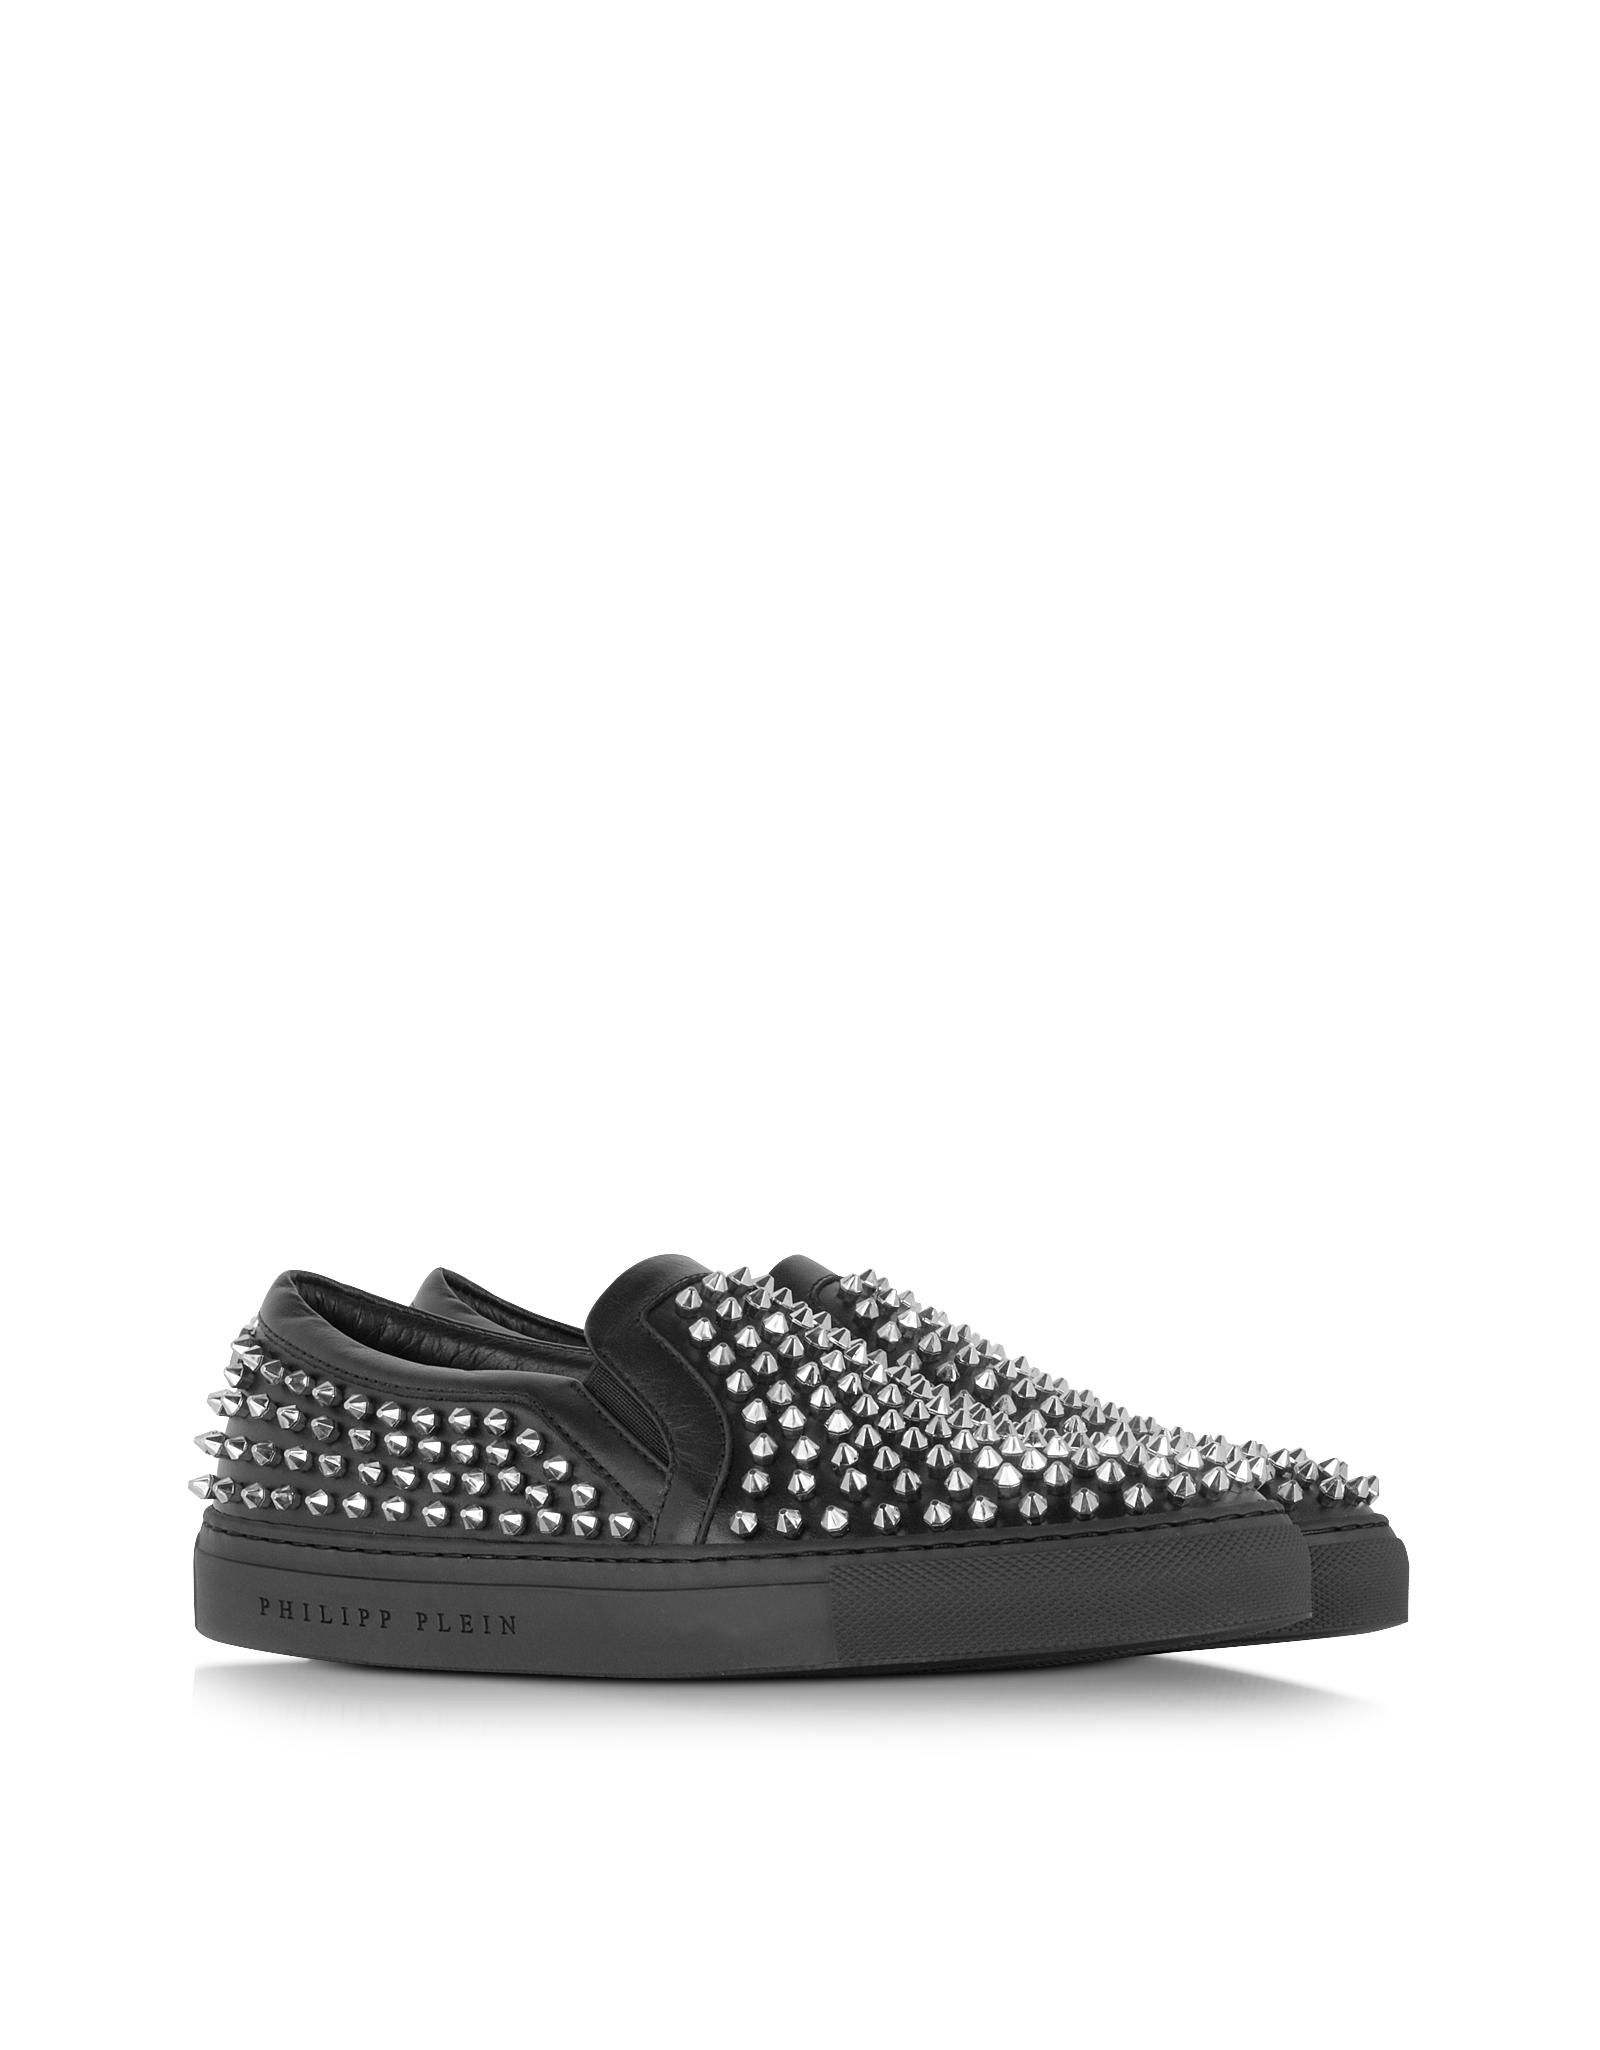 Leather Sneaker Wstuds On Possible Lyst Slip Wz6xpv Plein Philipp Black b7Ygy6f